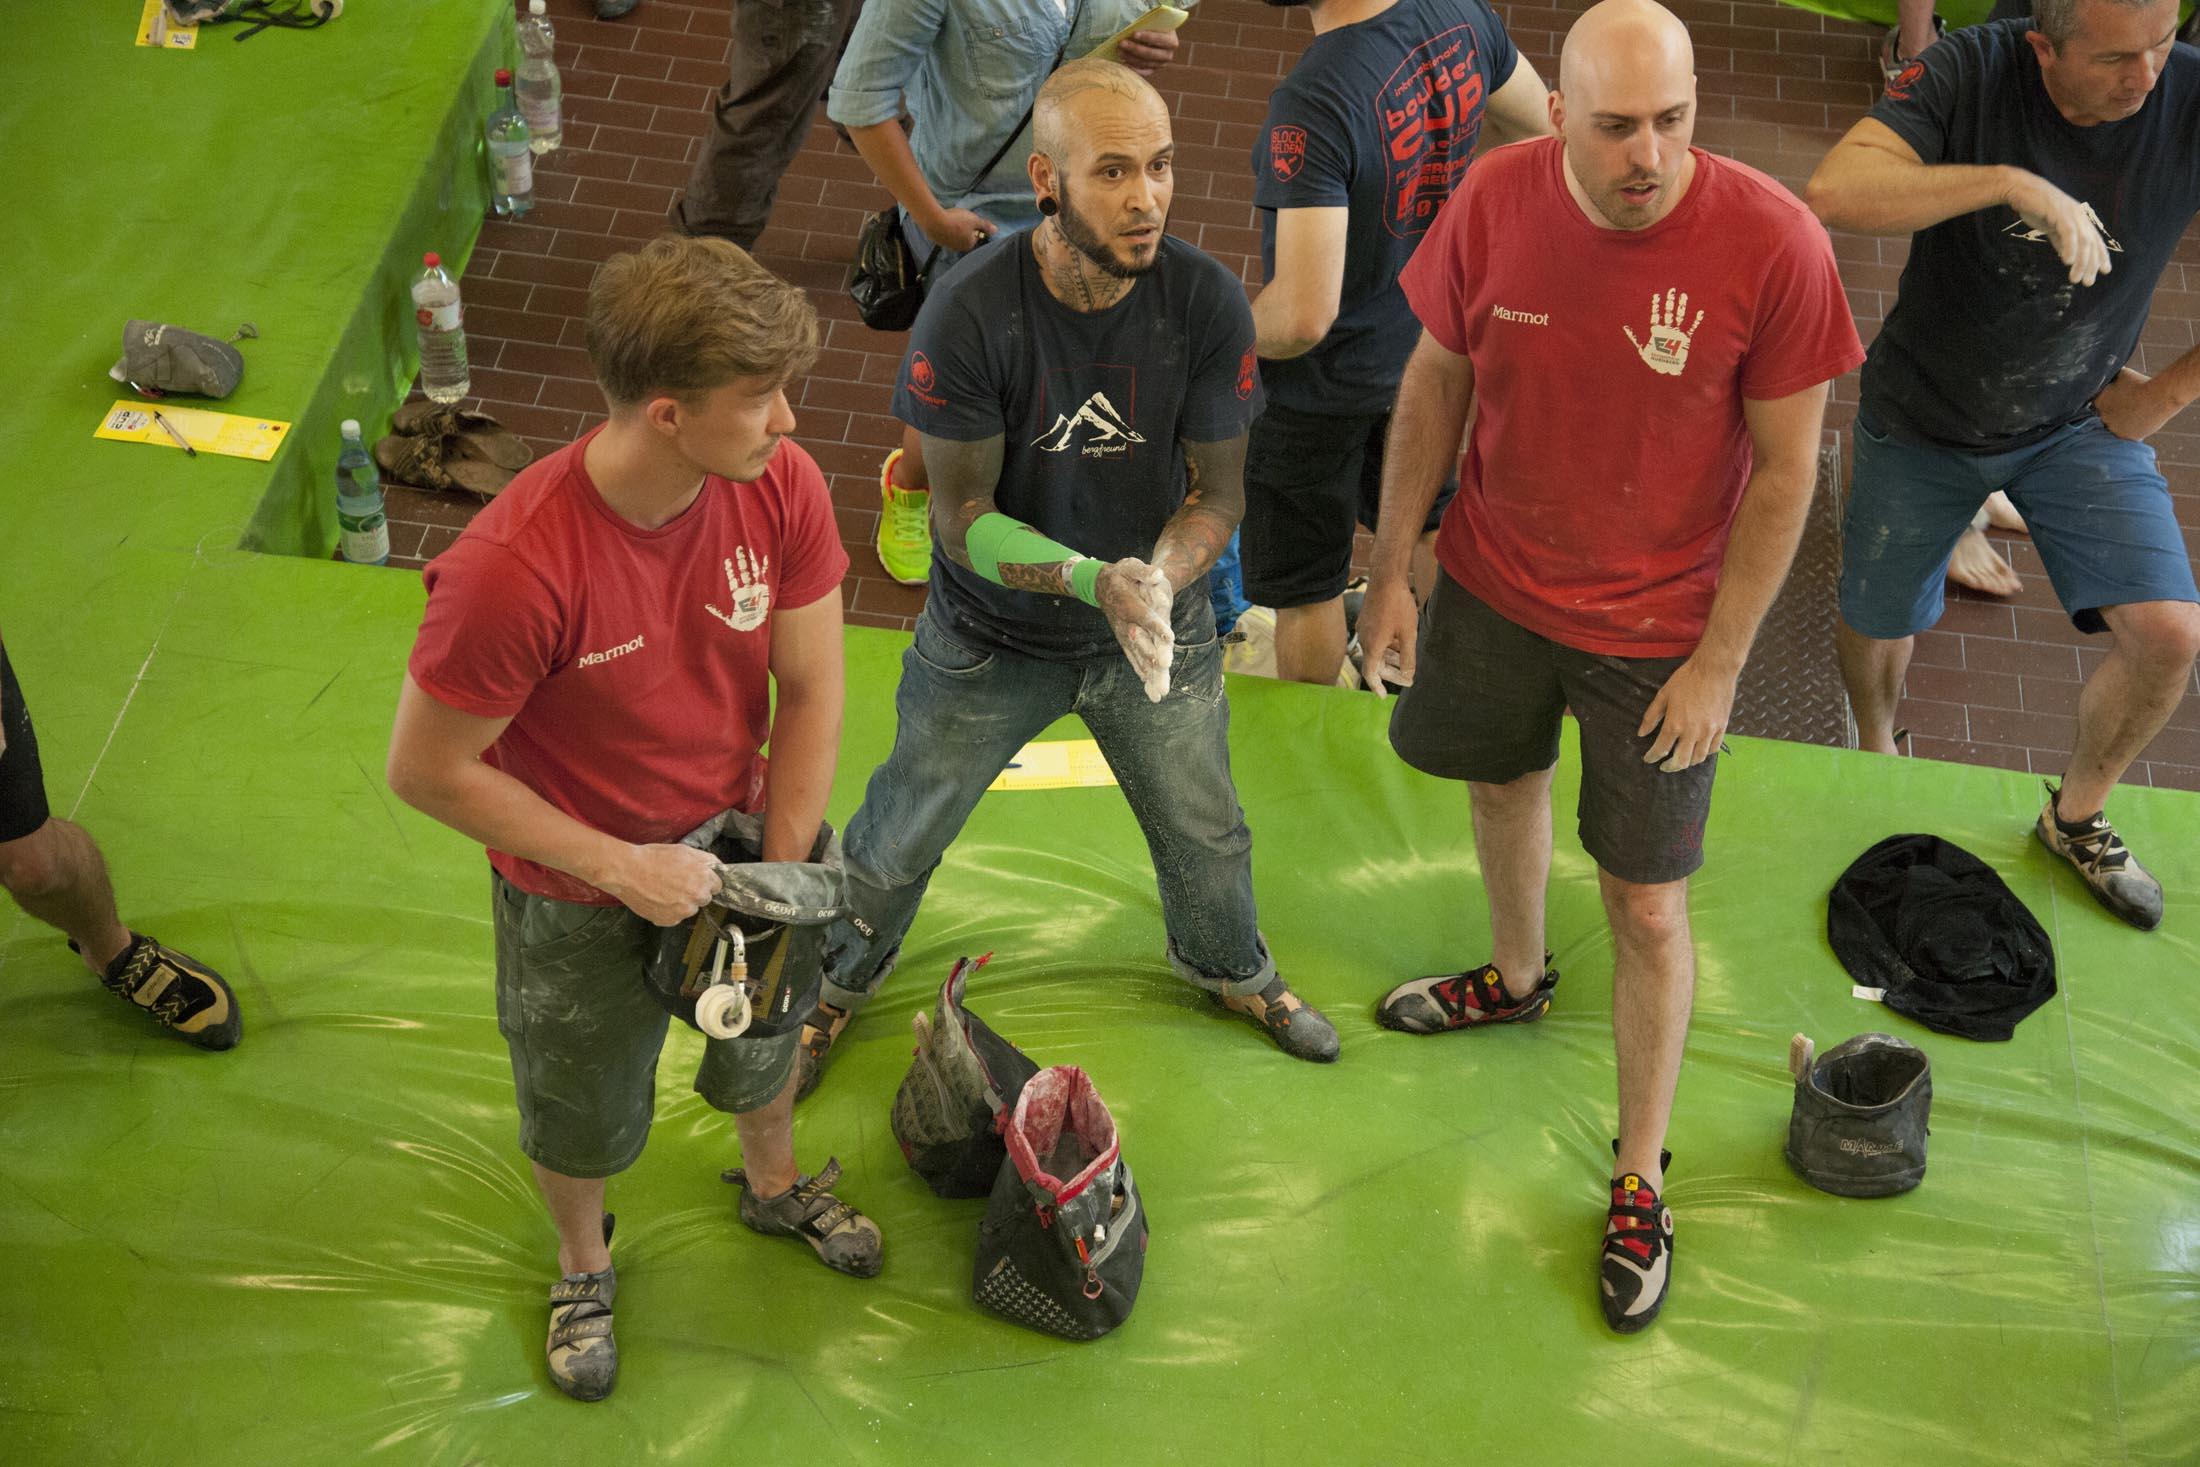 Quali, internationaler bouldercup Frankenjura 2016, BLOCKHELDEN Erlangen, Mammut, Bergfreunde.de, Boulderwettkampf07092016131